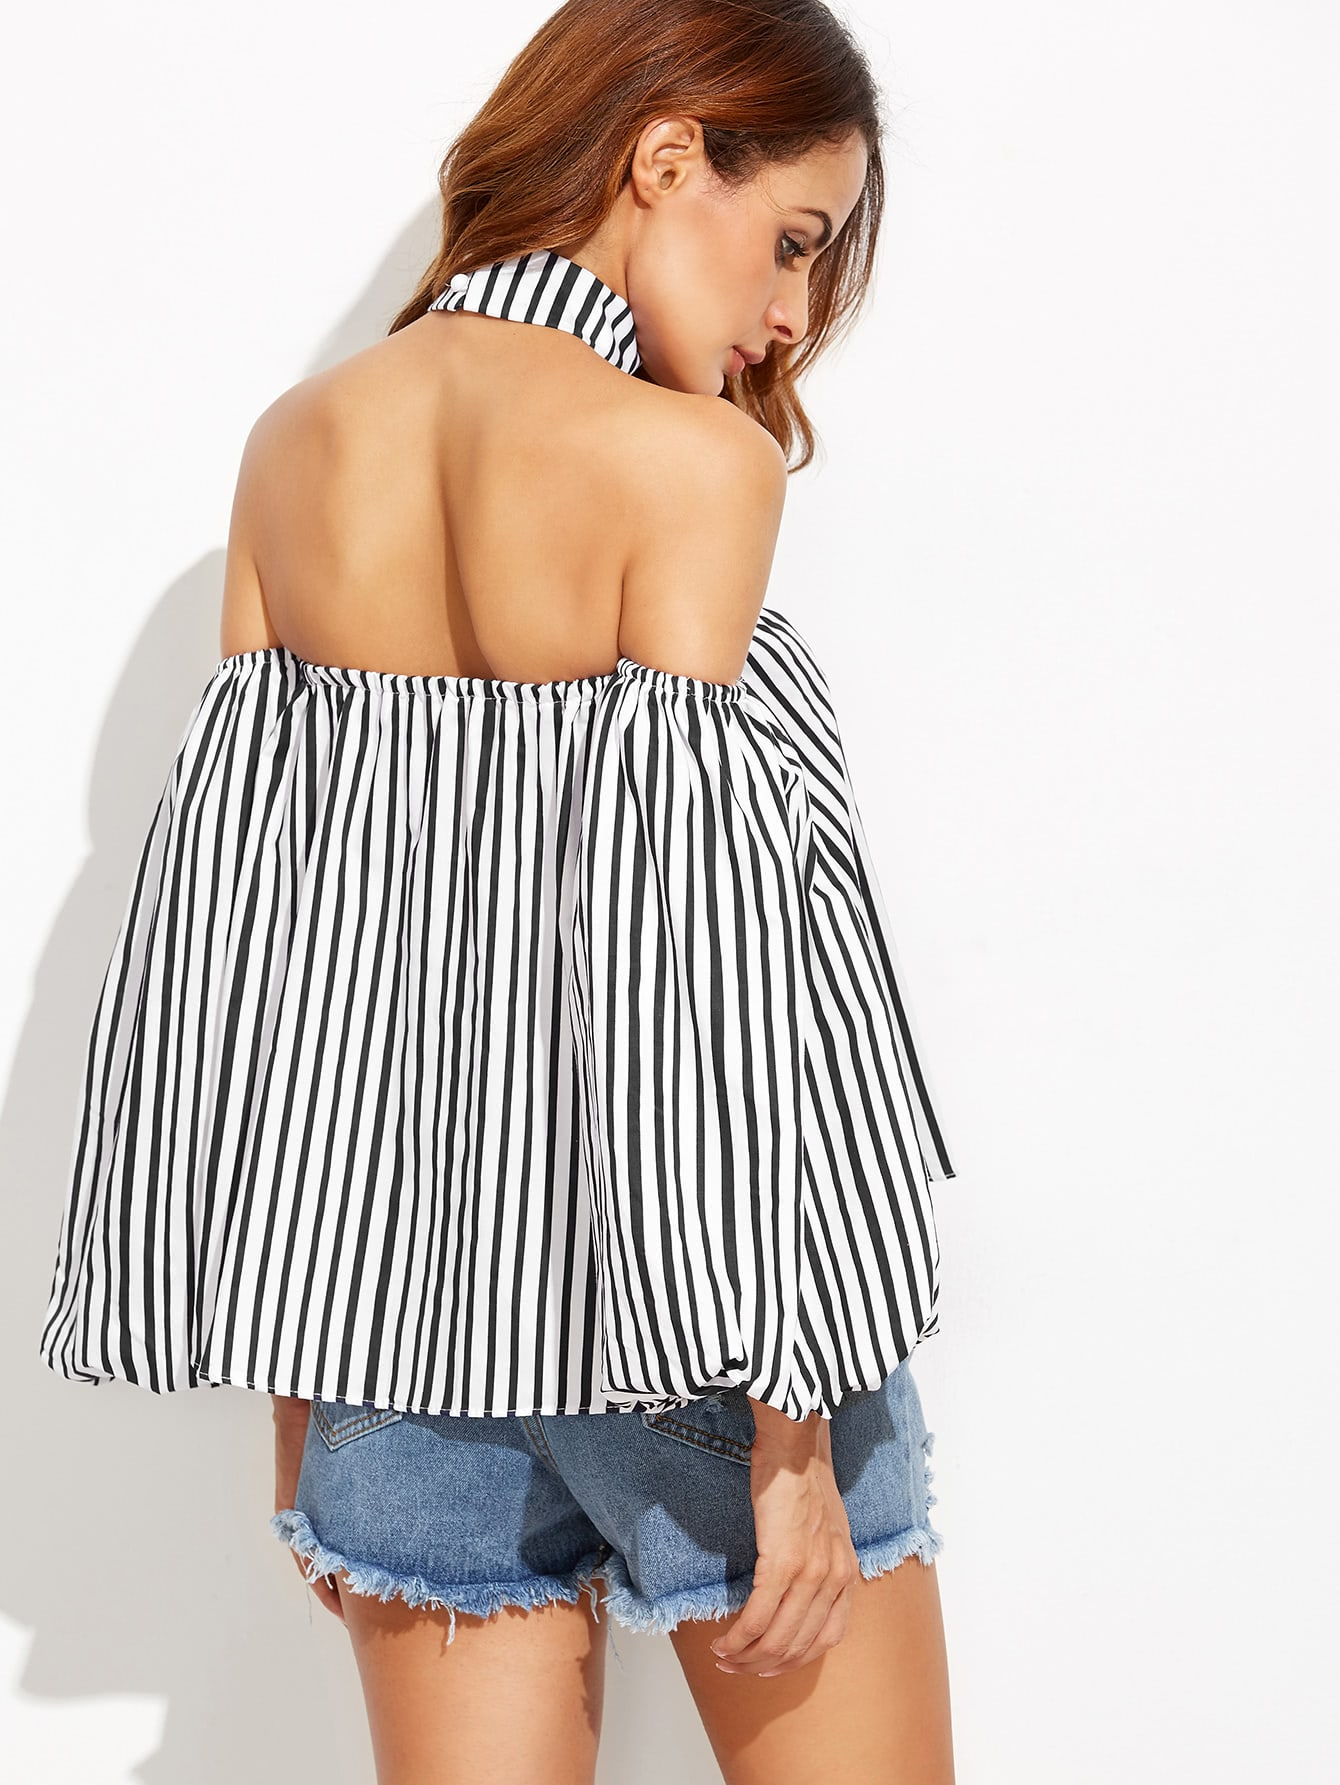 blouse161012102_2